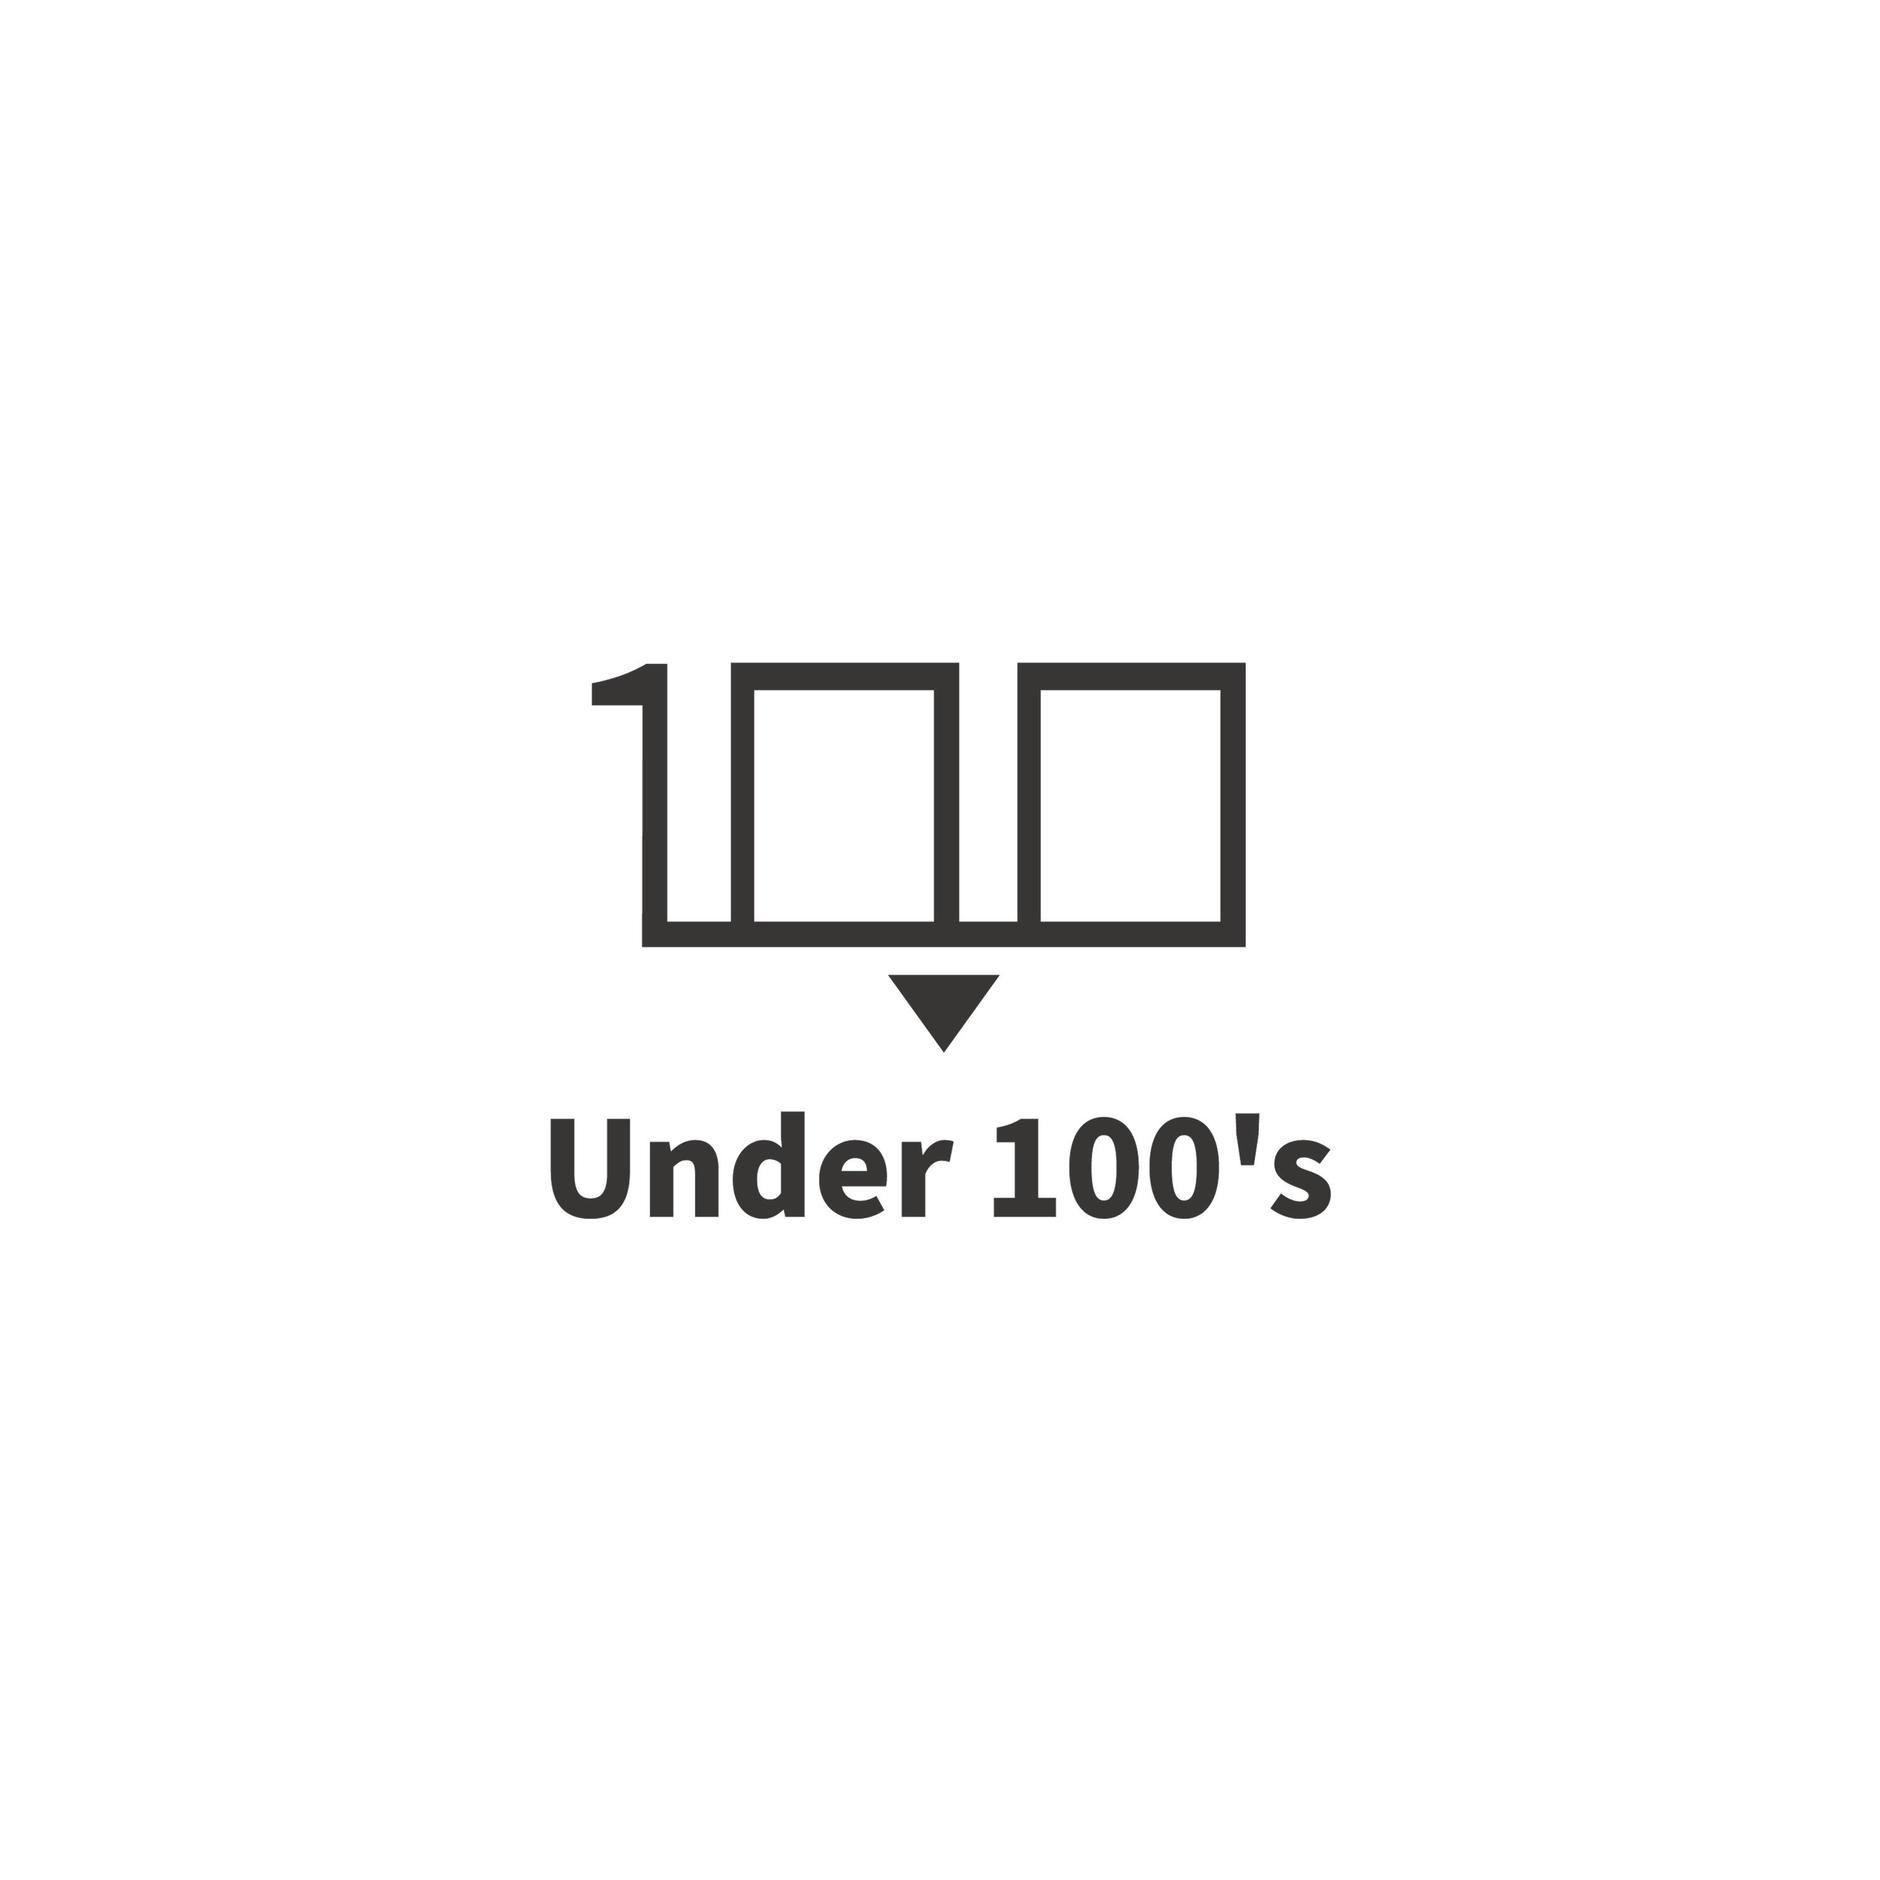 under100's-アンダーハンドレッズ